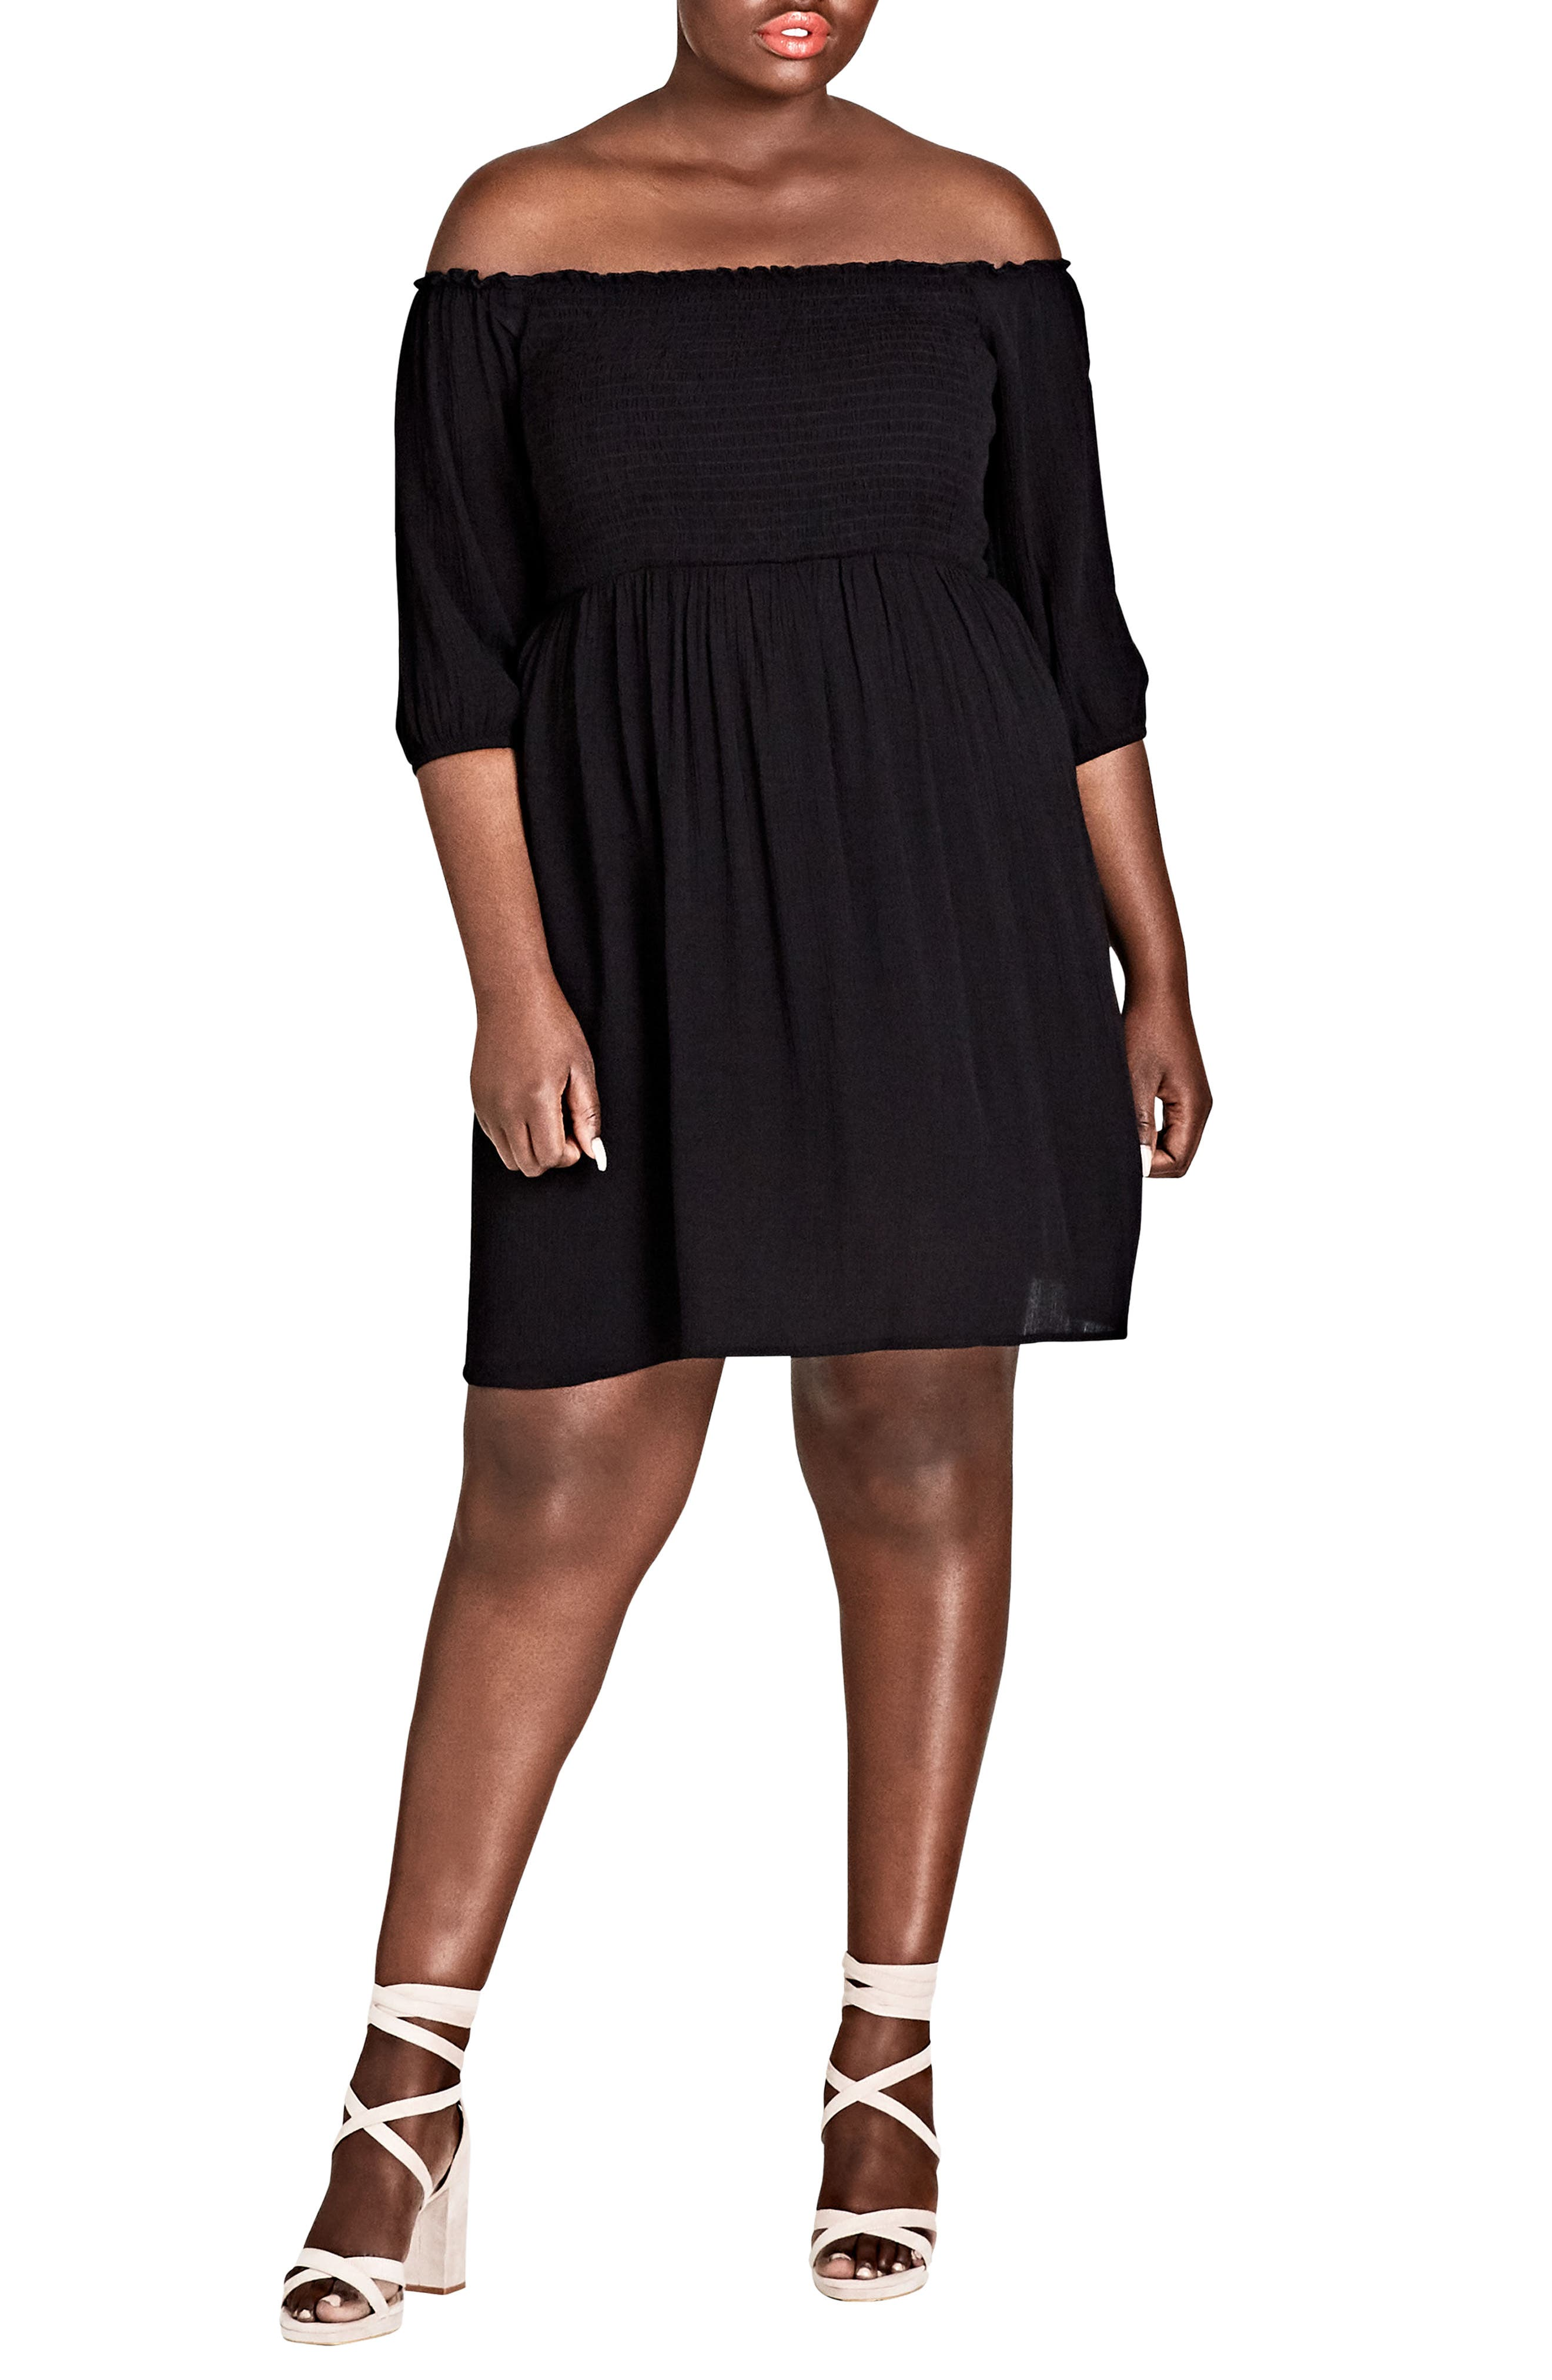 Calista Off the Shoulder Dress,                             Main thumbnail 1, color,                             BLACK